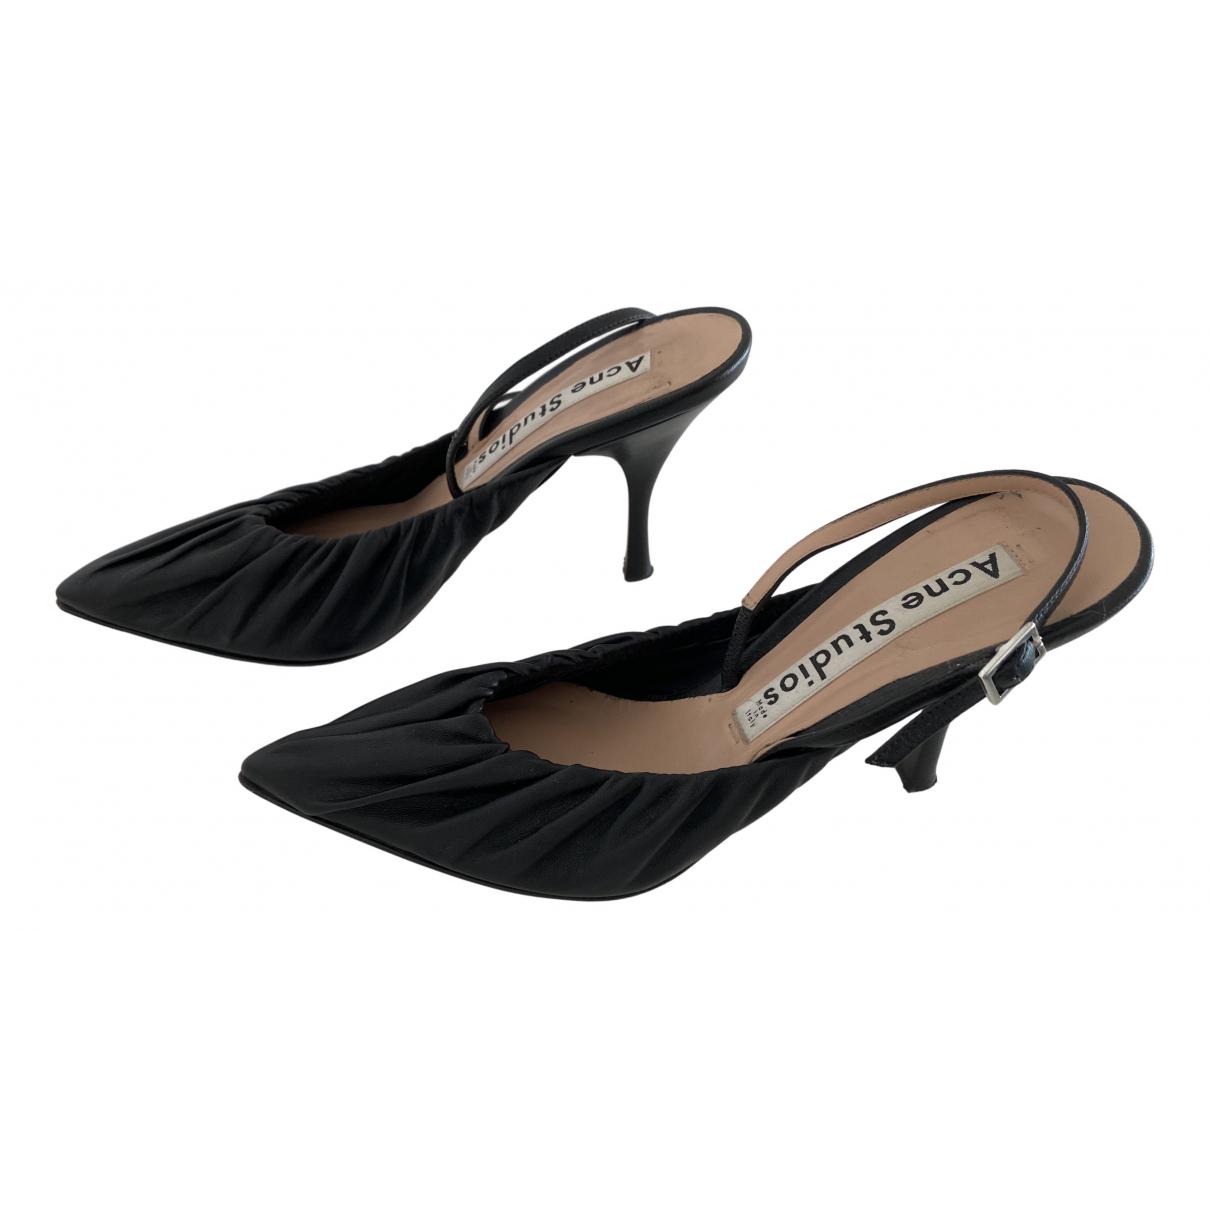 Acne Studios N Black Leather Sandals for Women 36 EU